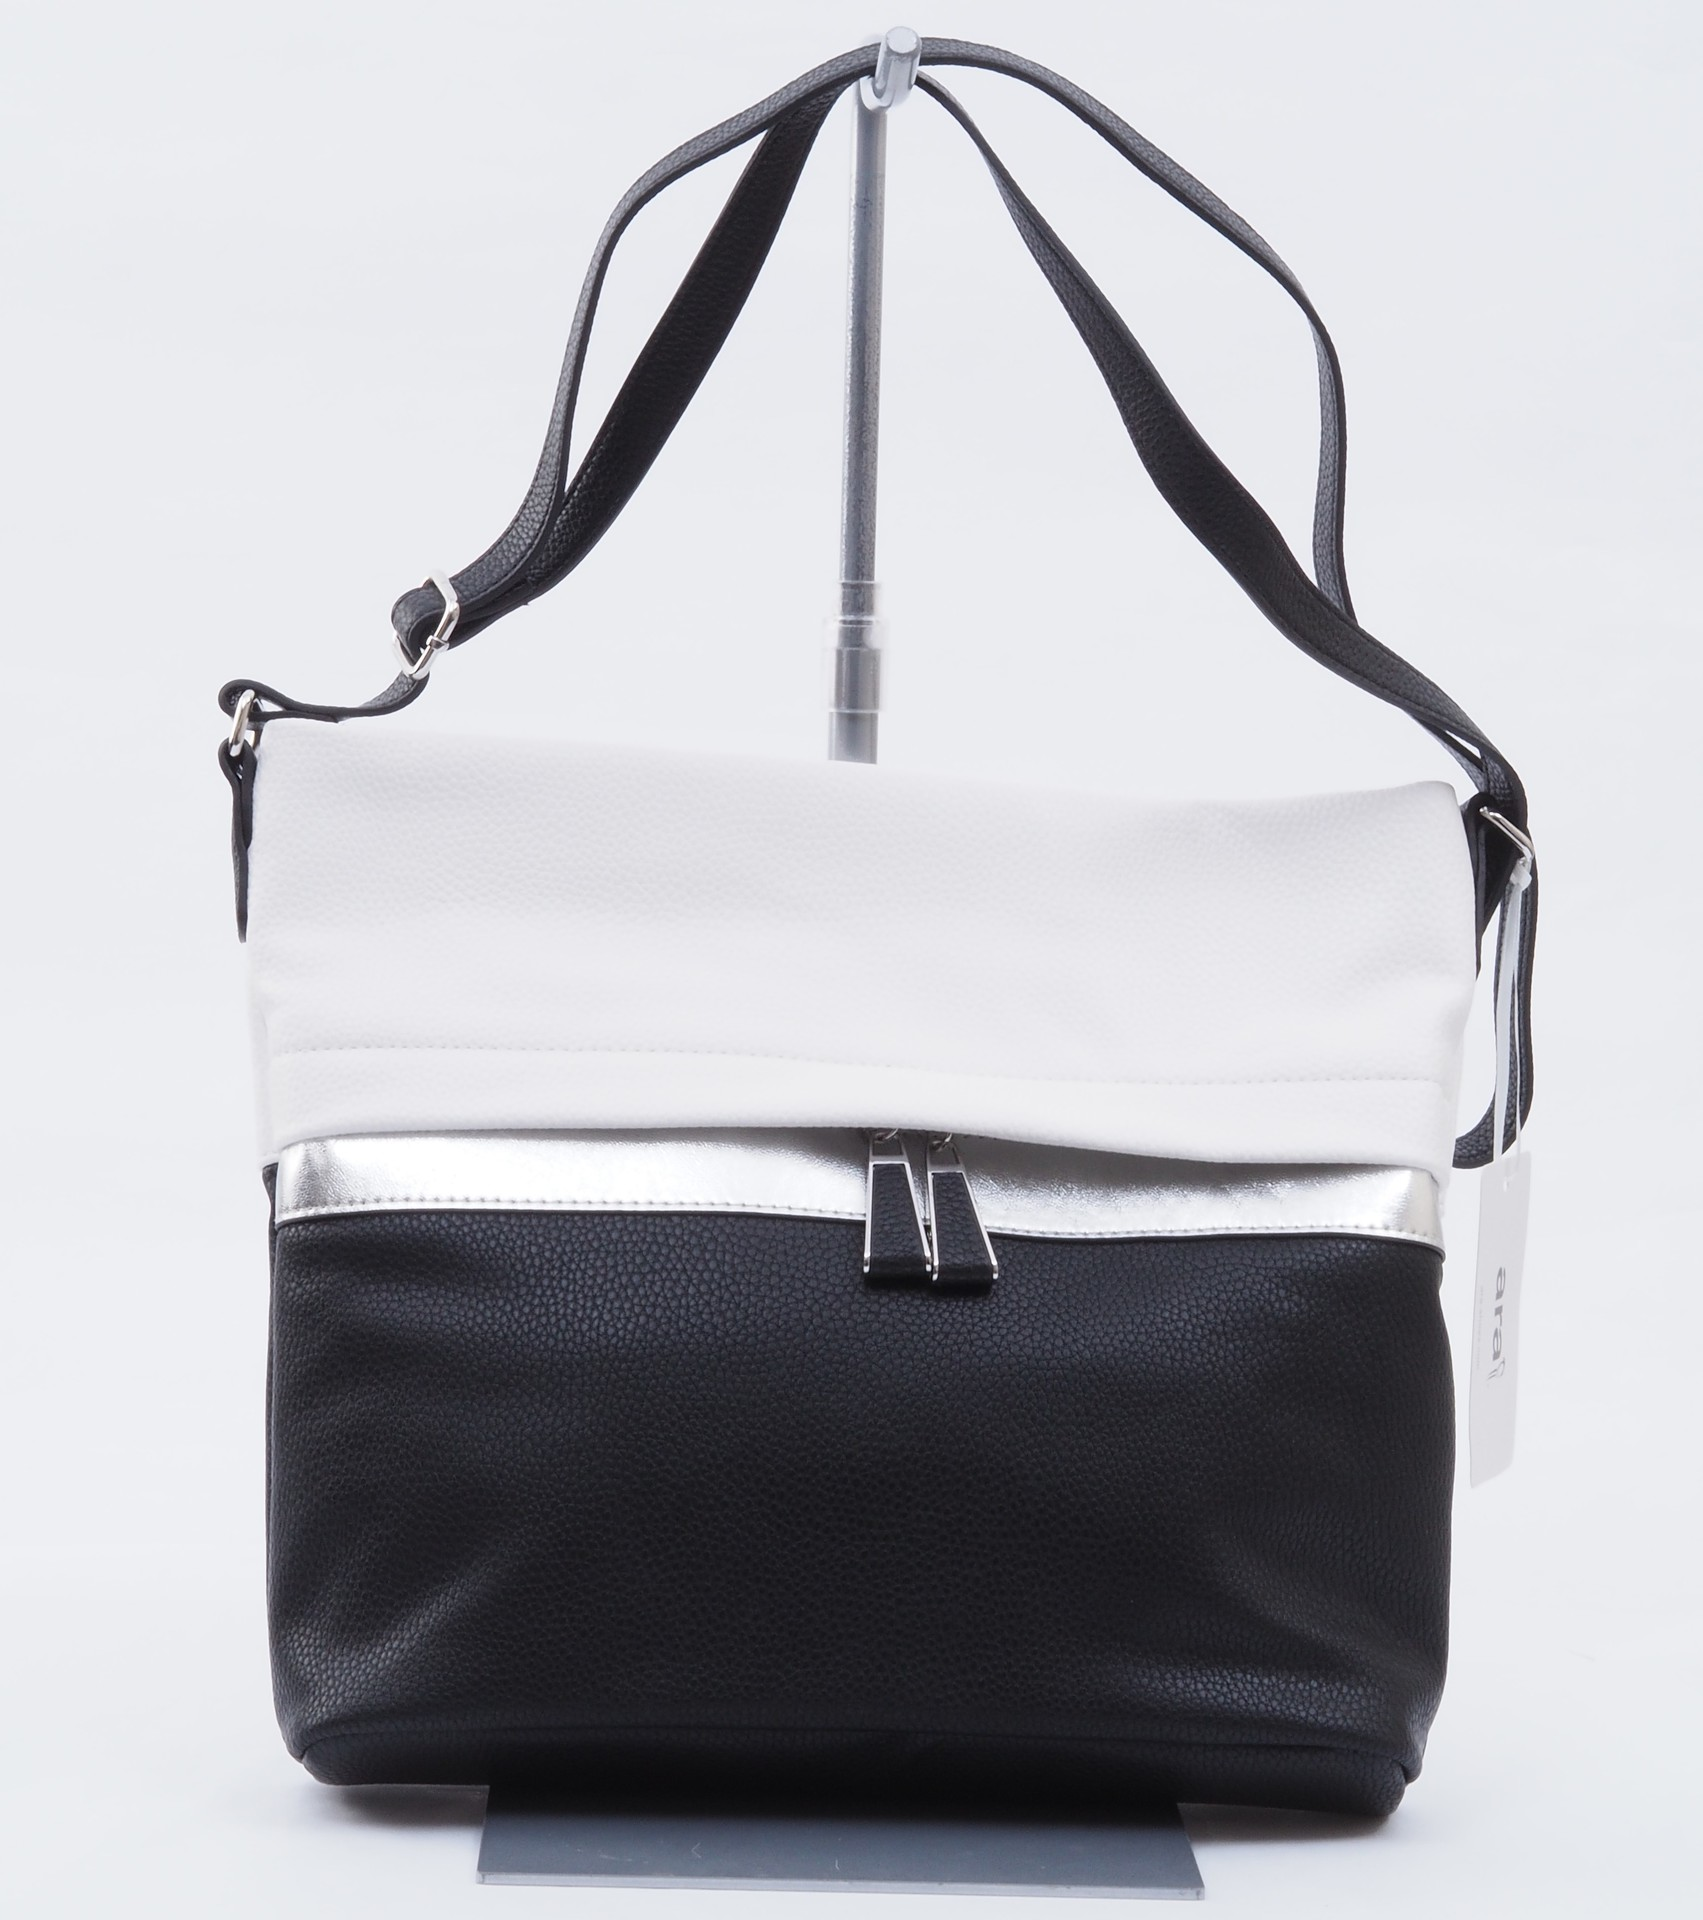 ARA - Dámske kabelky - Dámska kabelka cez telo (crossby) čierna 58b2f25f12c